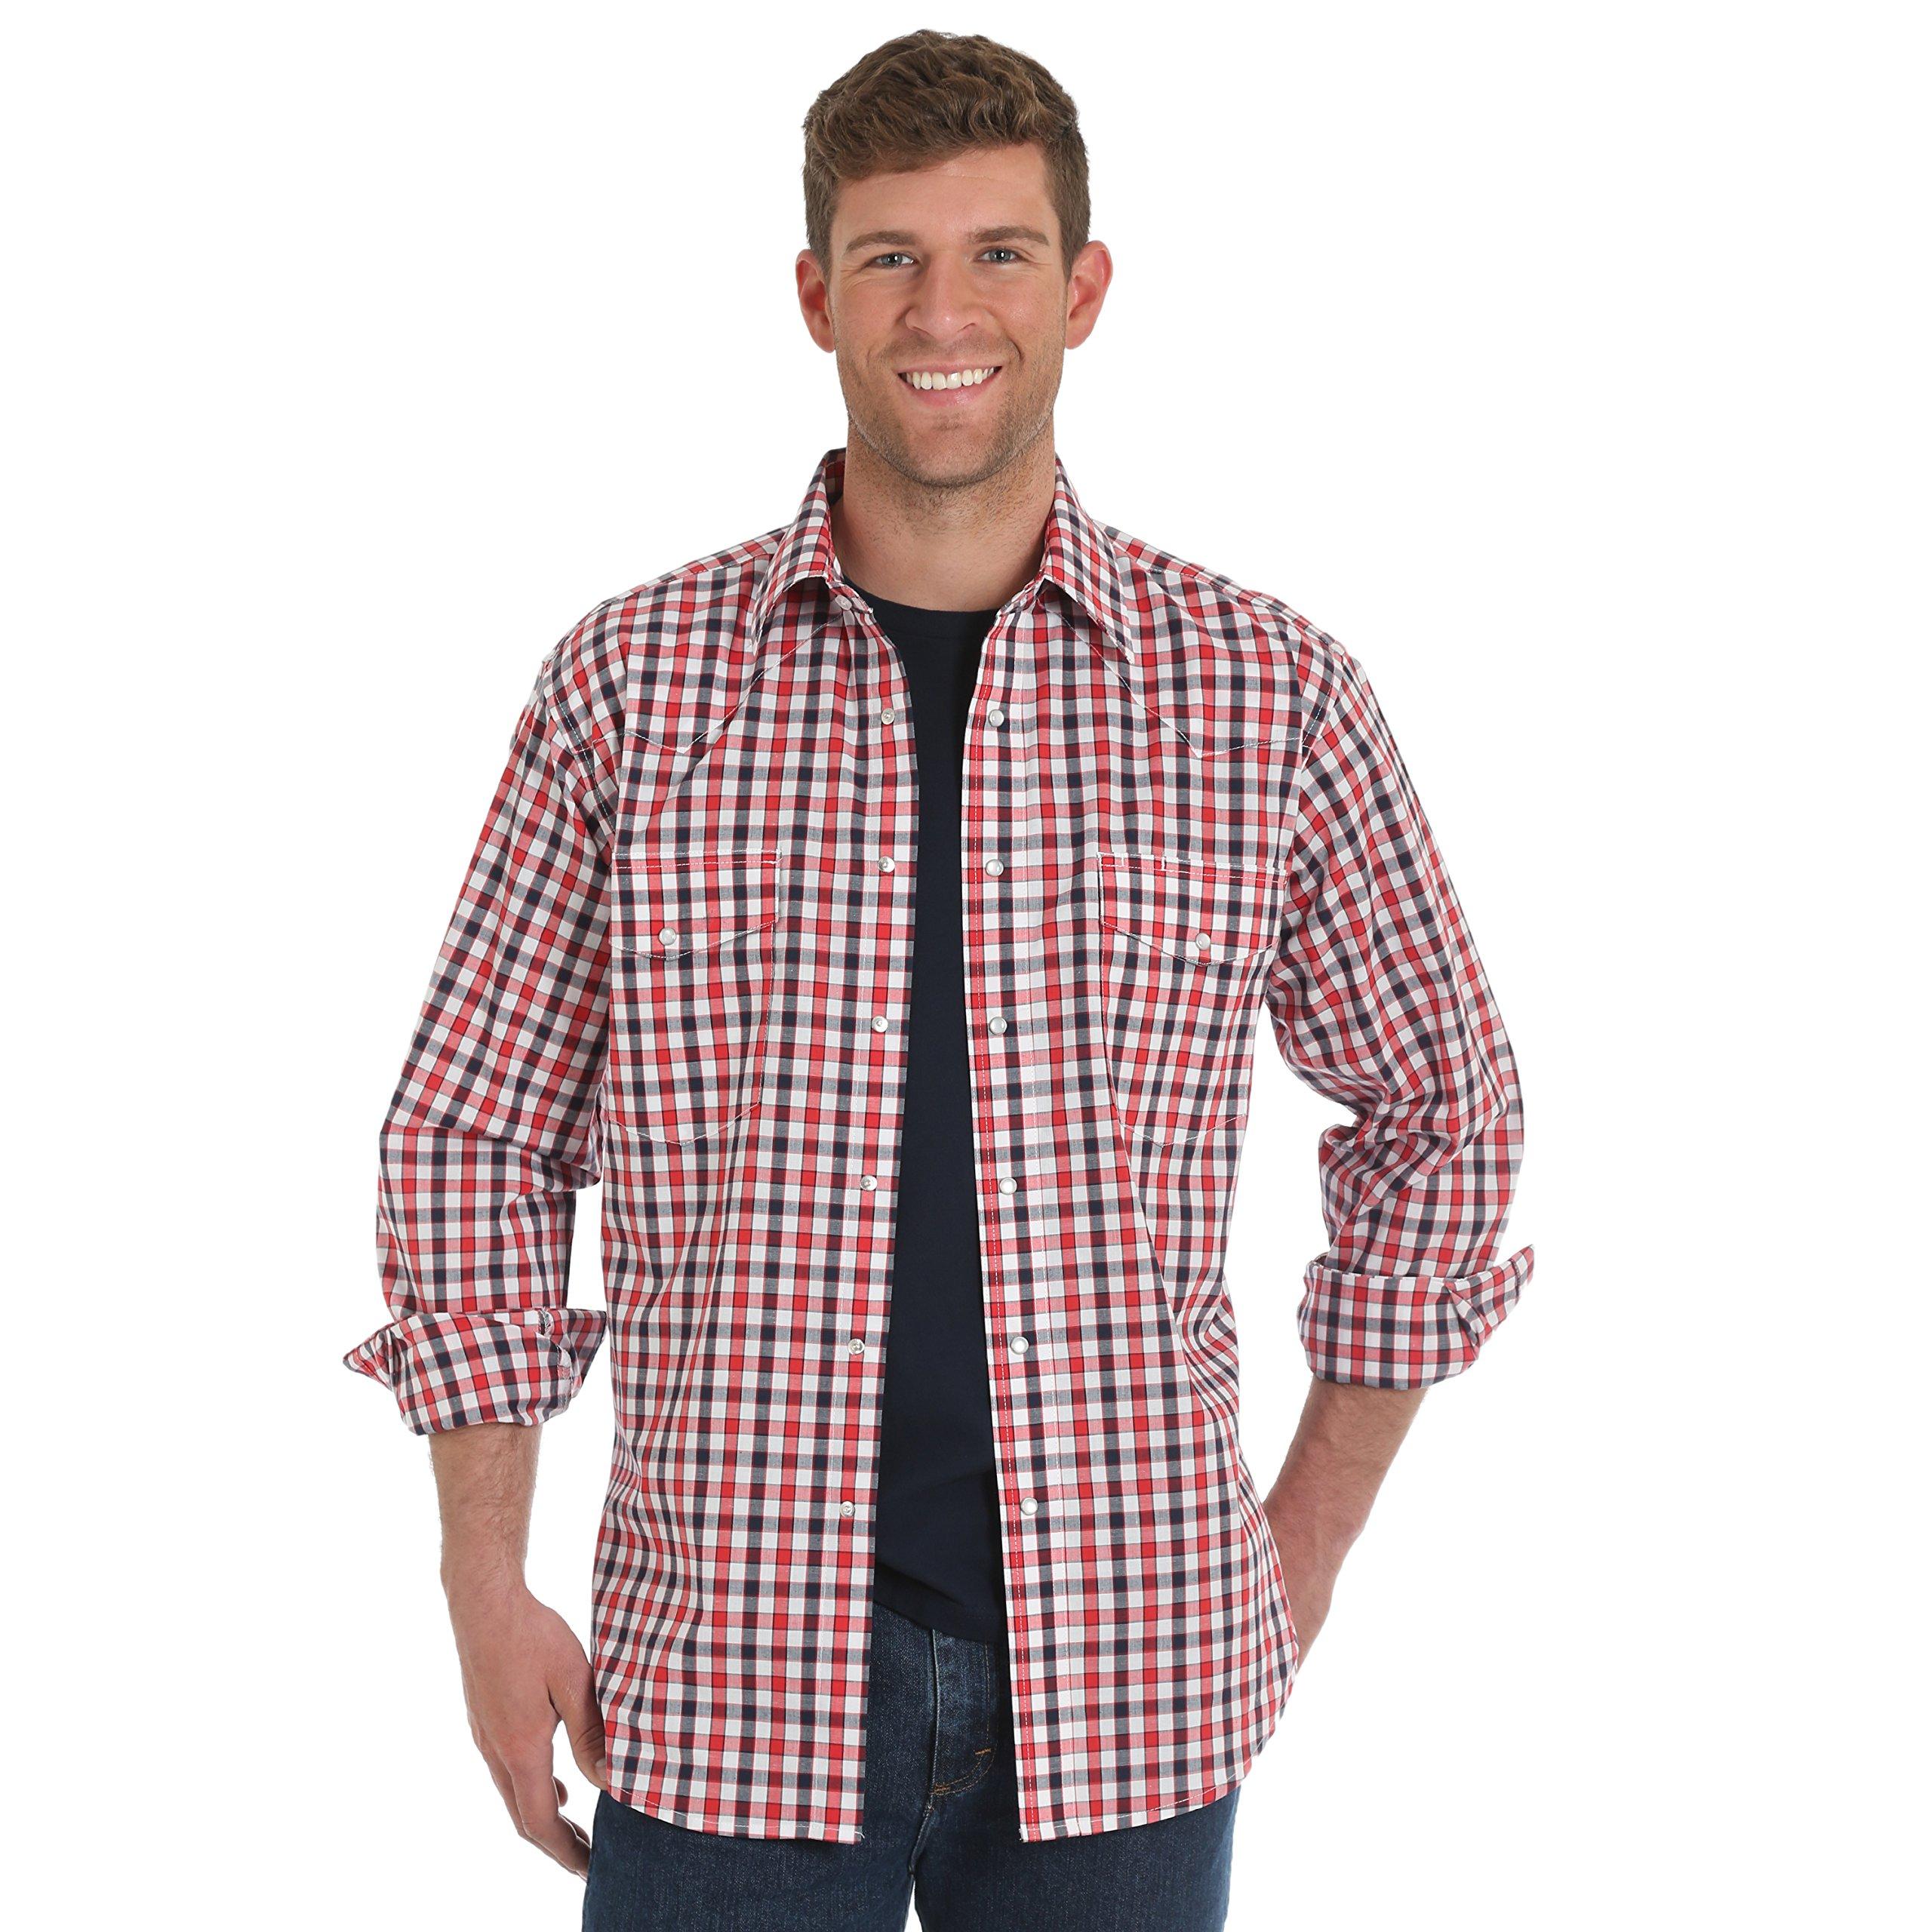 Wrangler Men's Wrinkle Resist Two Pocket Long Sleeve Snap Shirt, Red/Blue Plaid, L